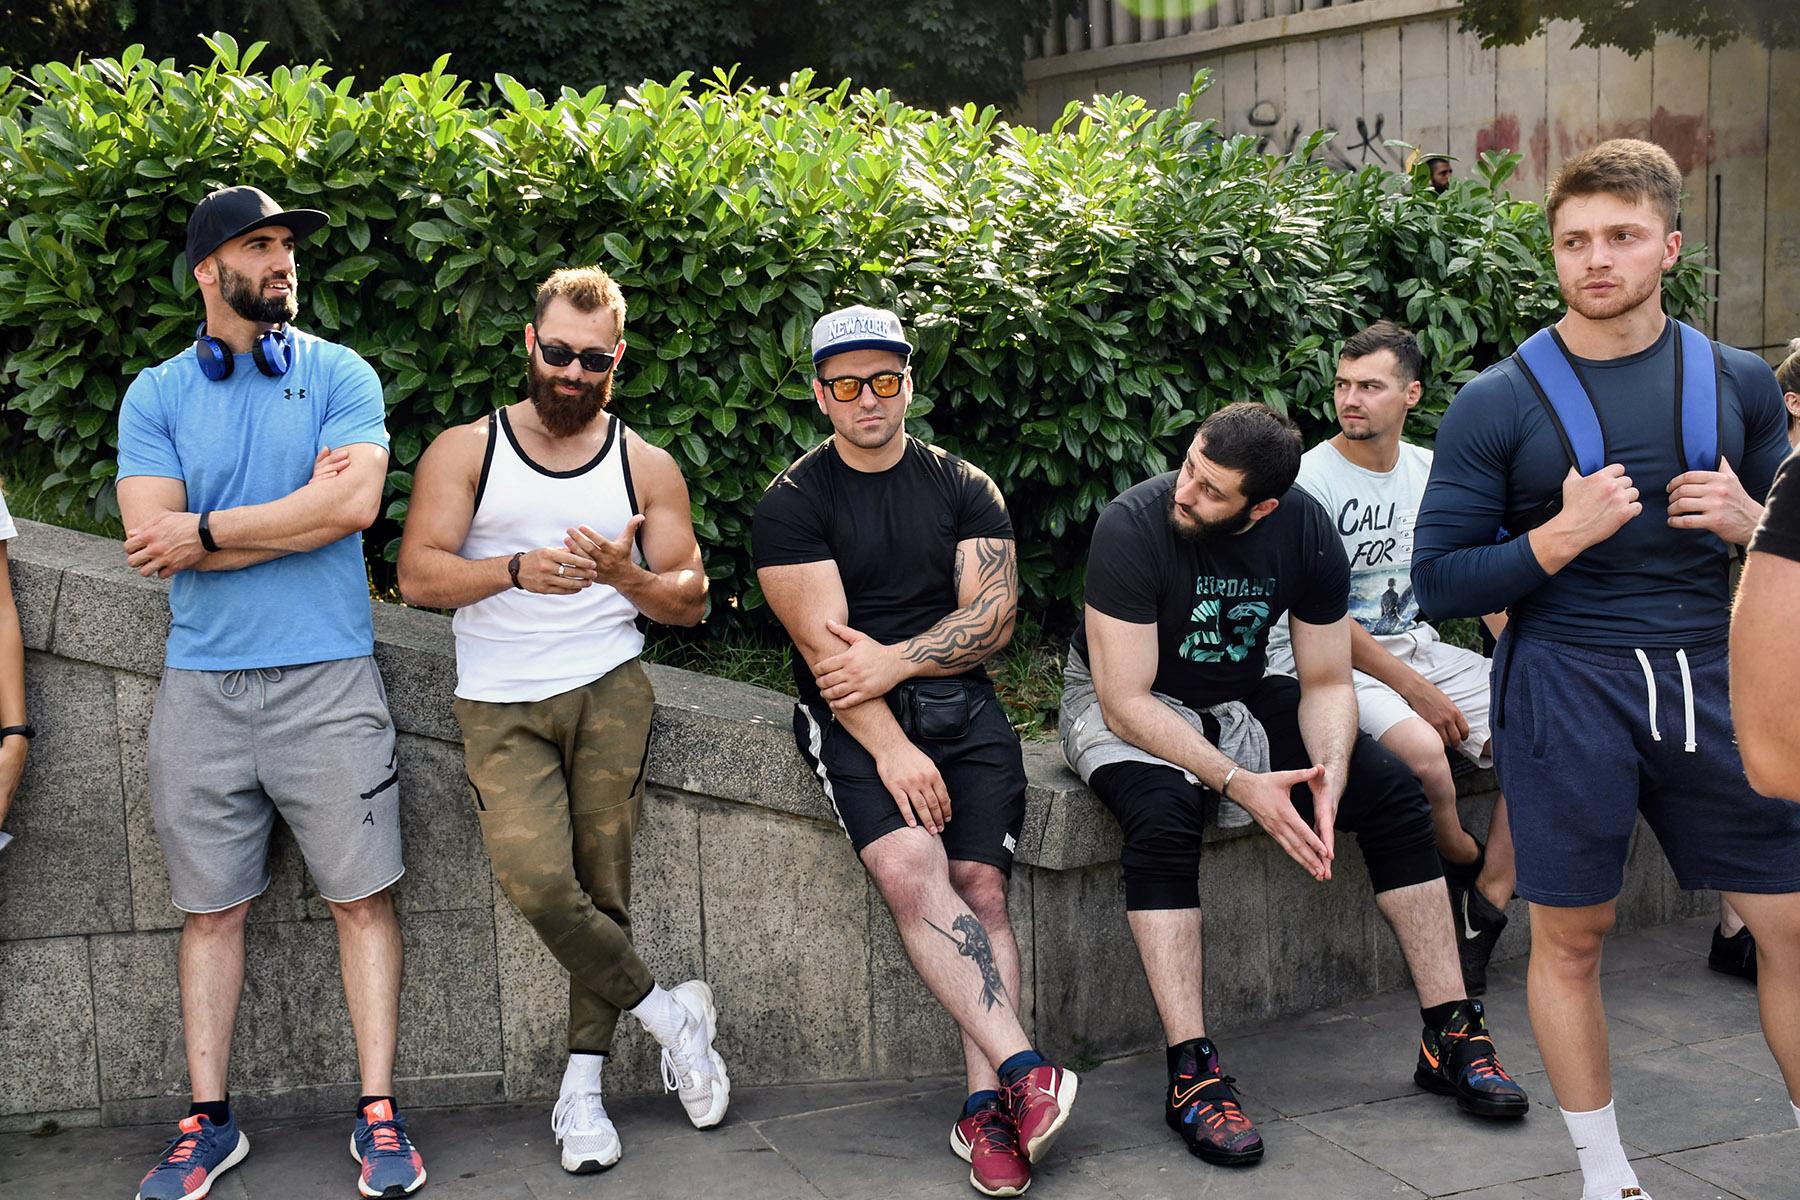 Протестующие у метро Руставели 2 июня. Фото: Шота Хинча / OC Media.